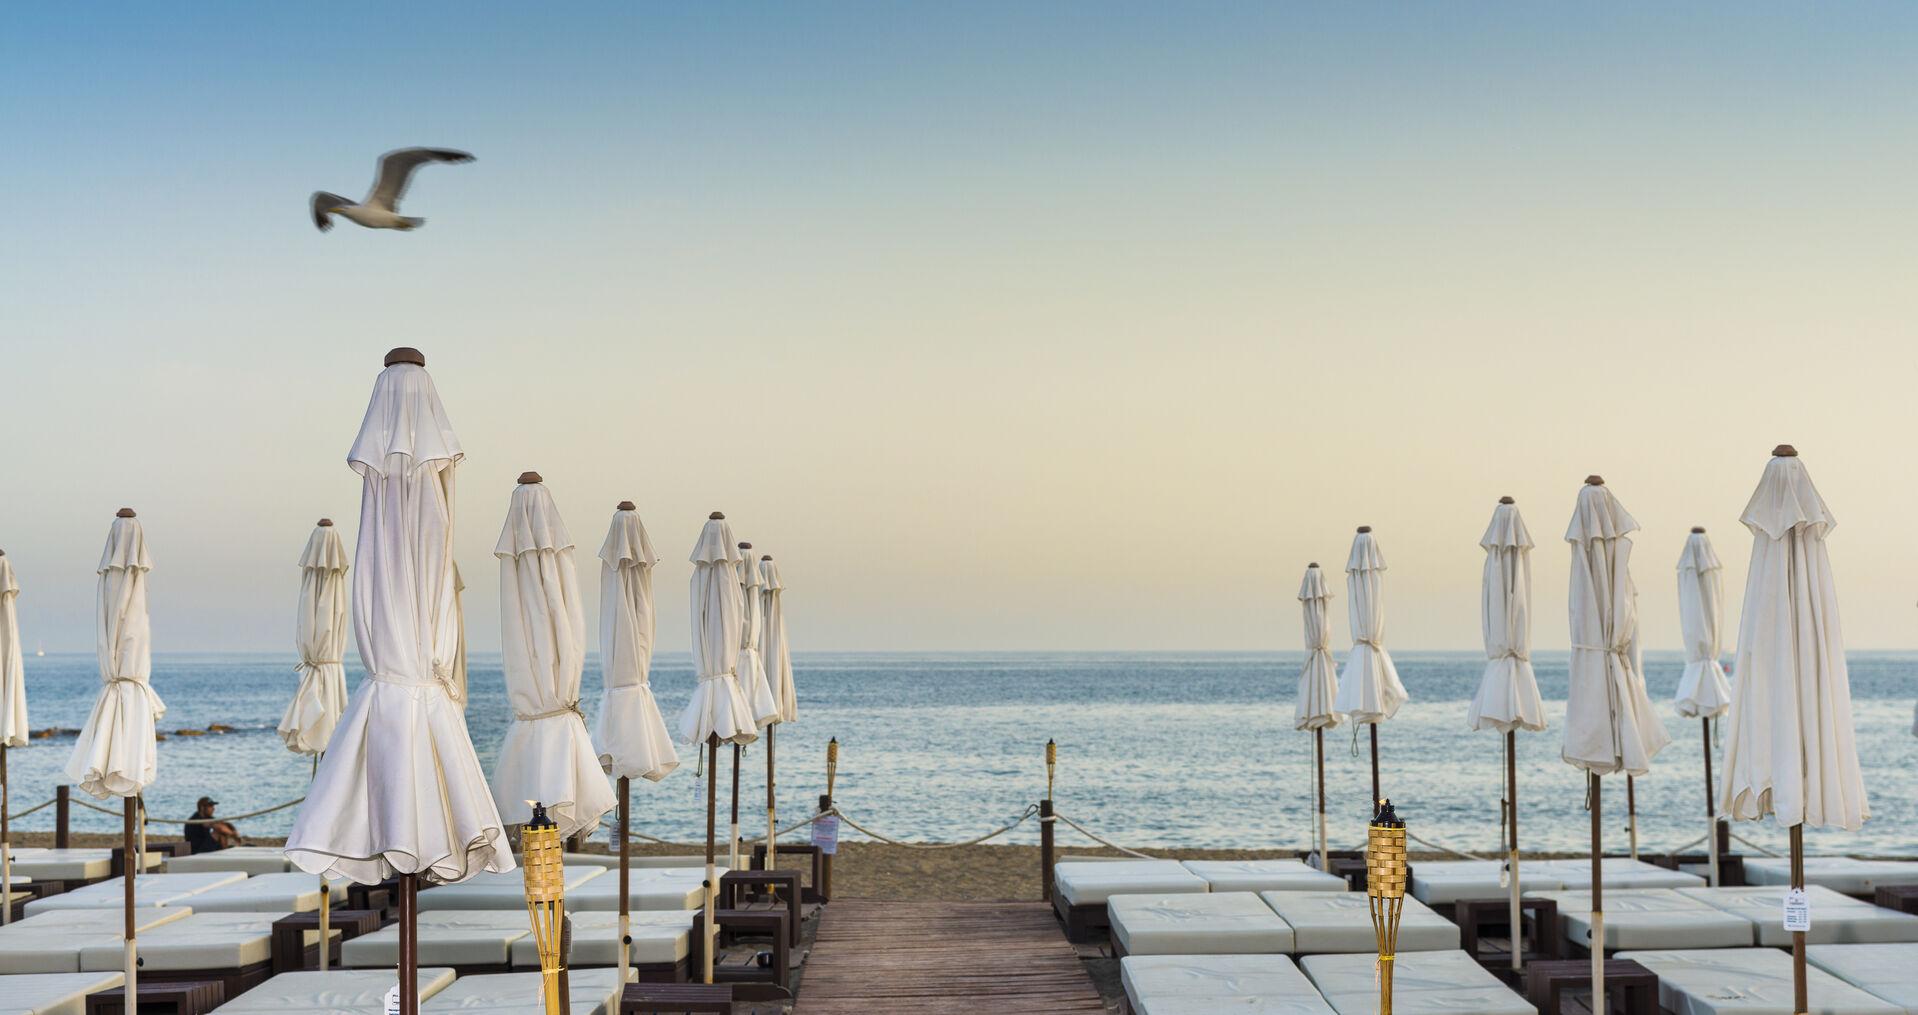 https://cms.satur.sk/data/imgs/tour_image/orig/amare-marbella-beach-camas-atardecer-1972168.jpg